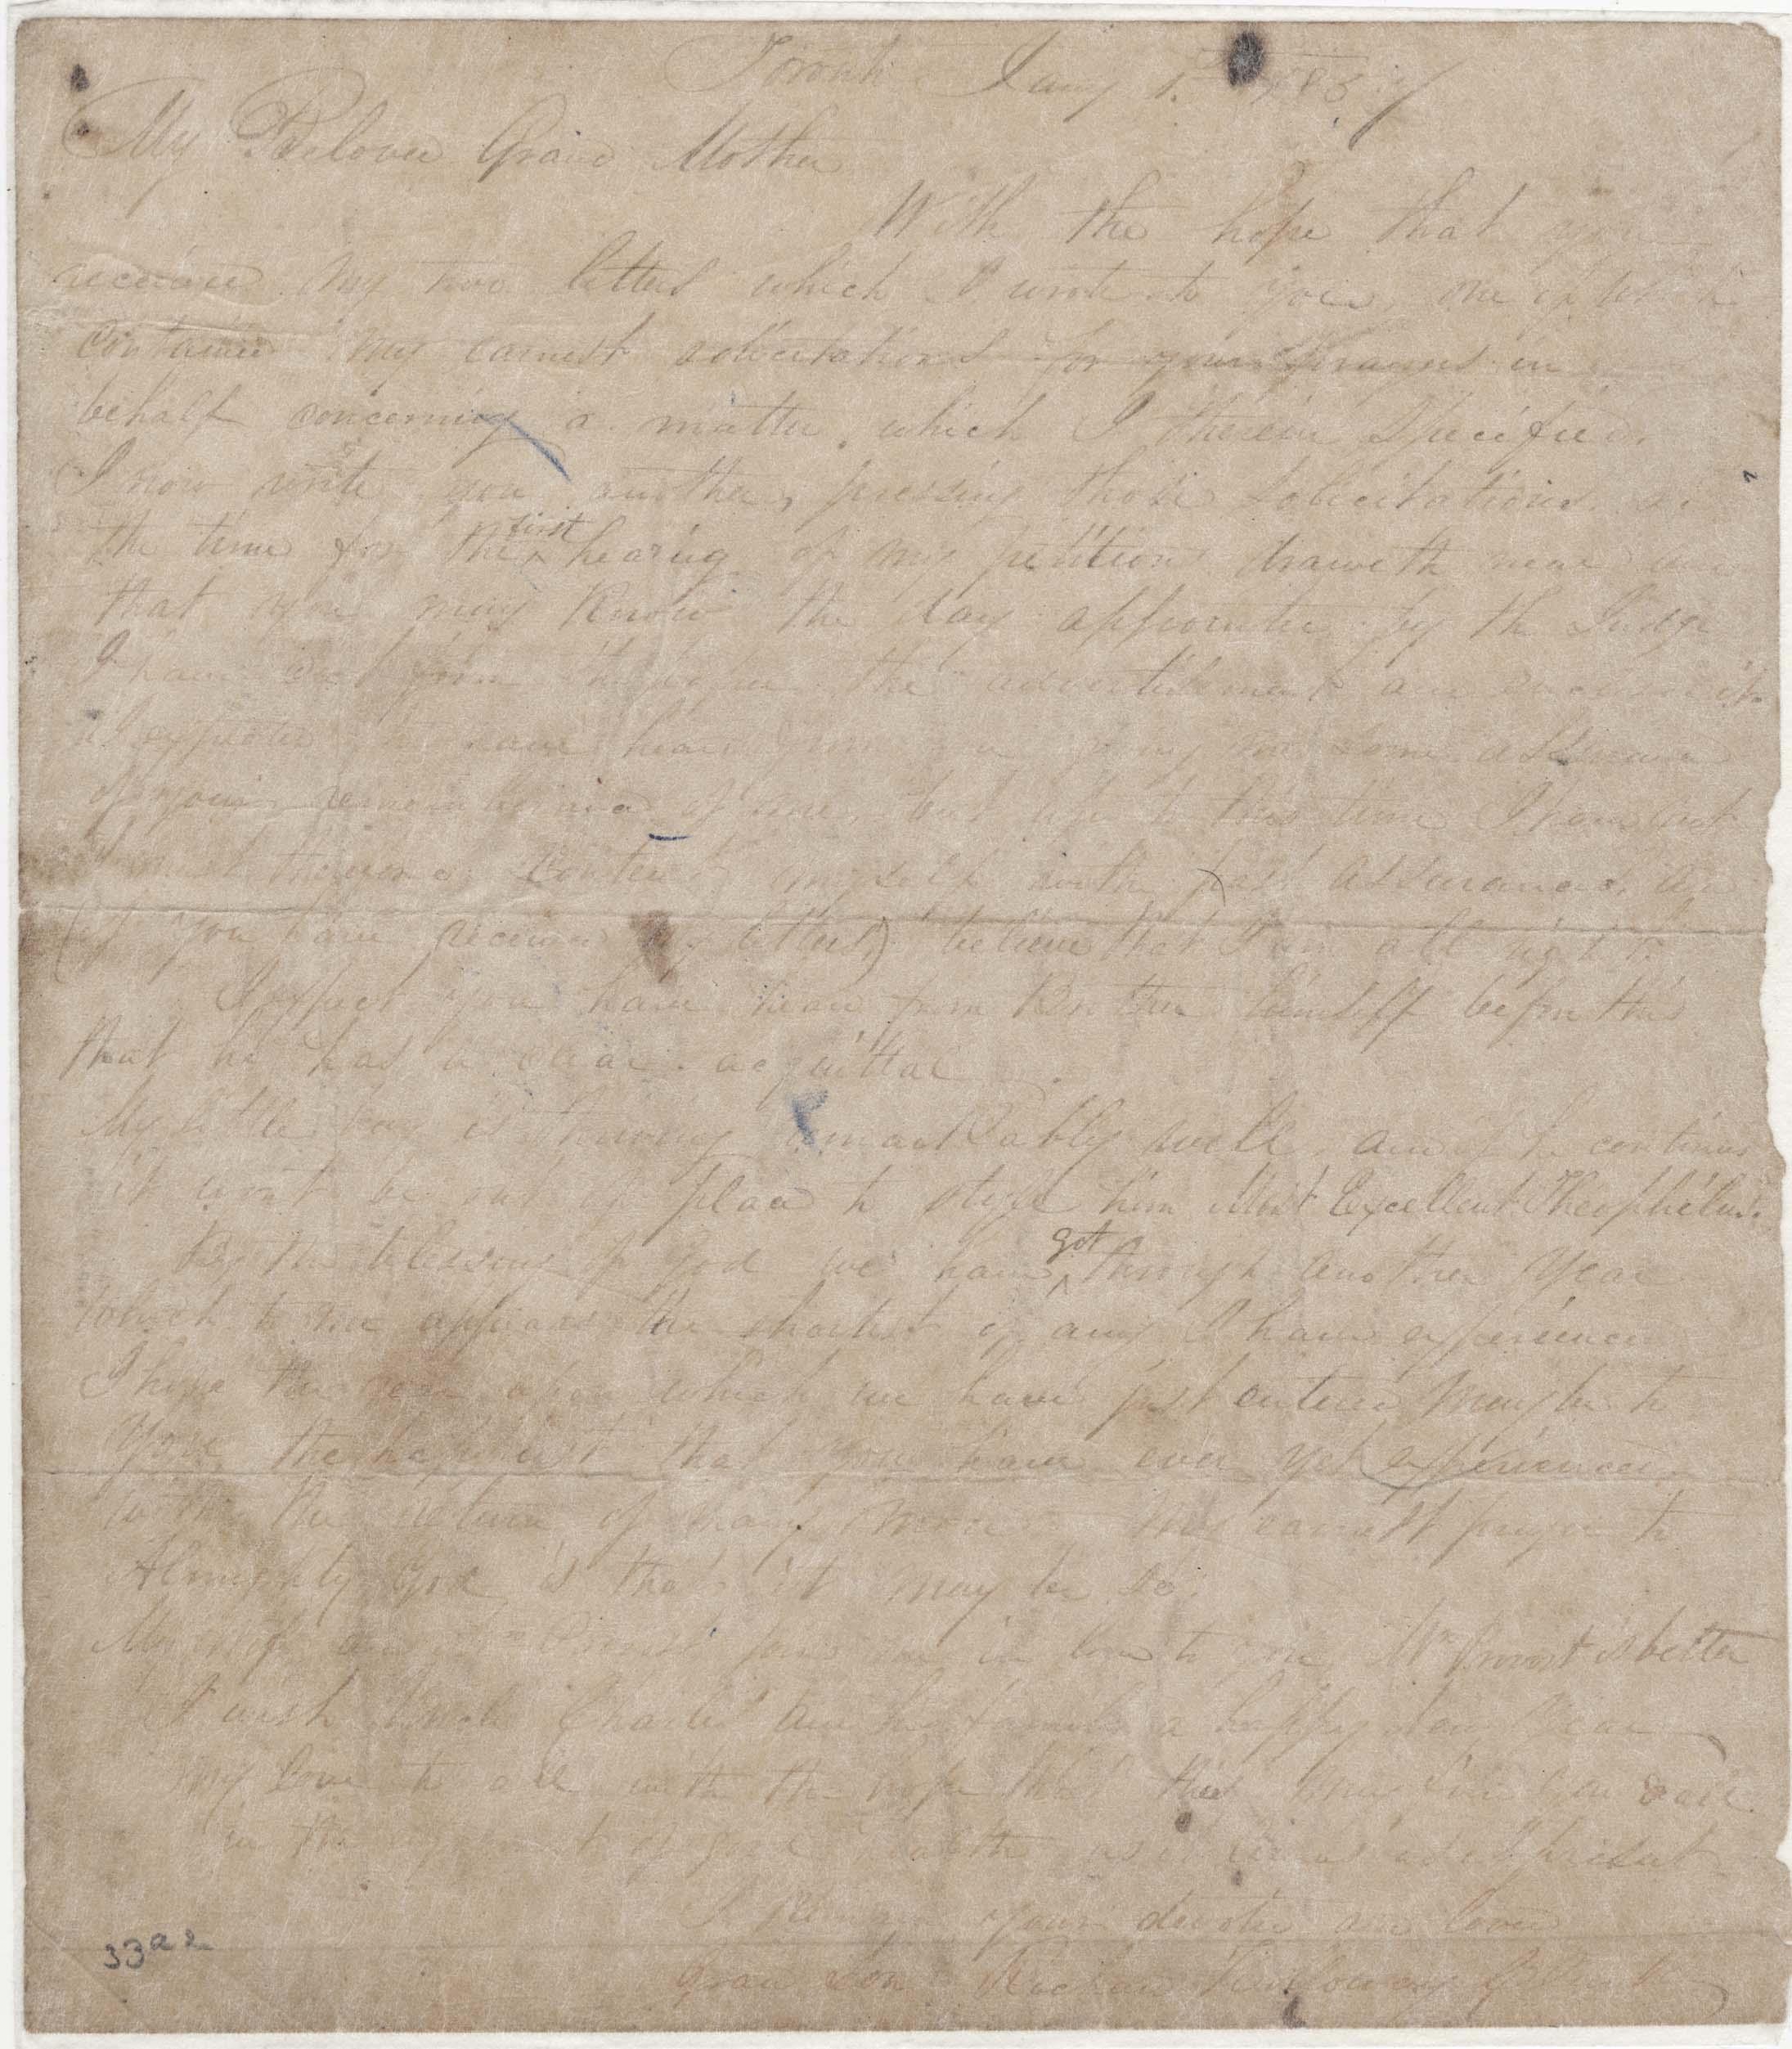 Richard Holloway Clark to grandmother Elizabeth Holloway, Jan. 1, 1857